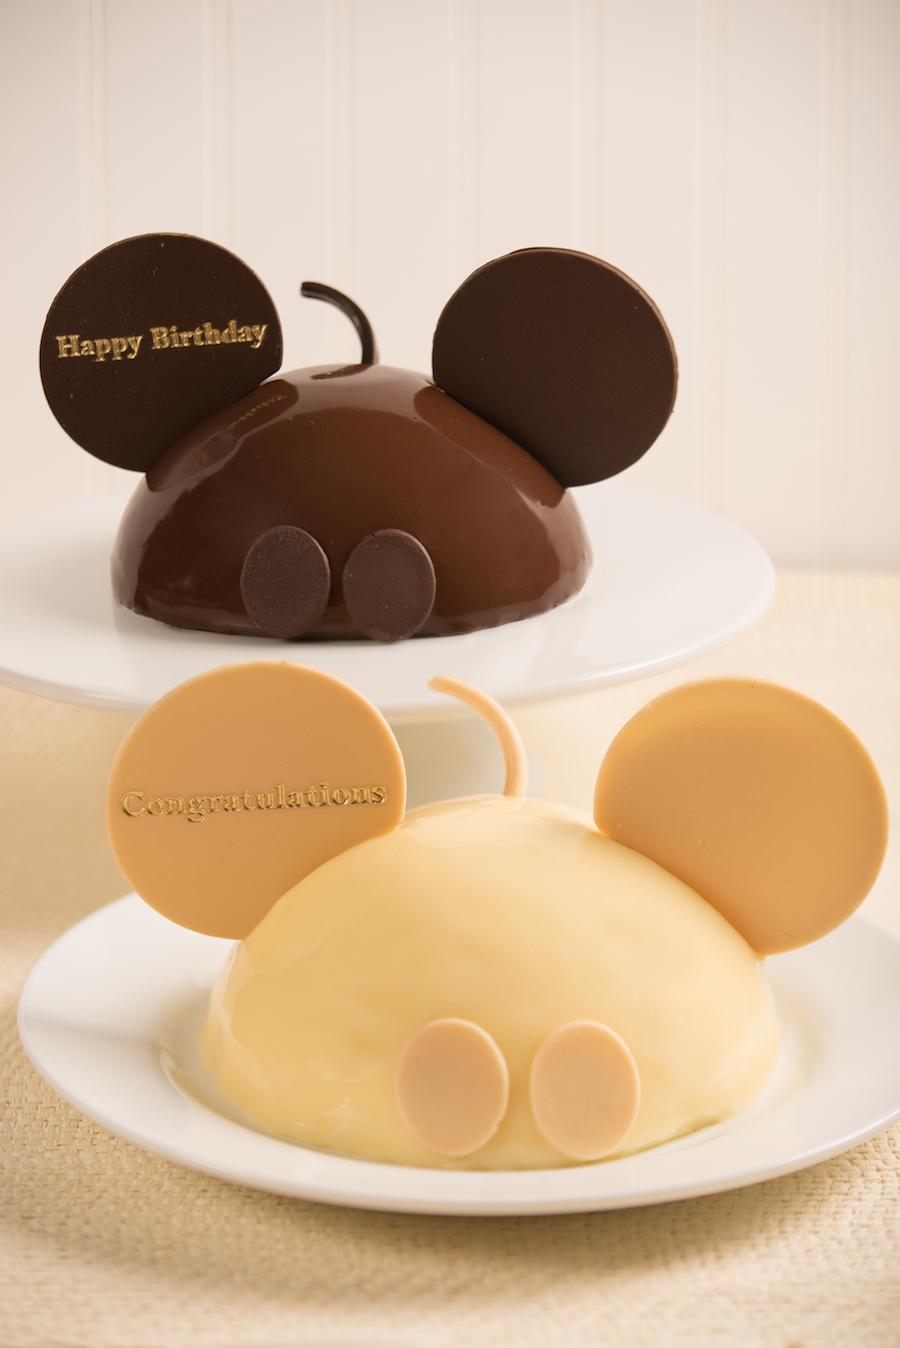 MickeyCake-VanillaChocolate1287948